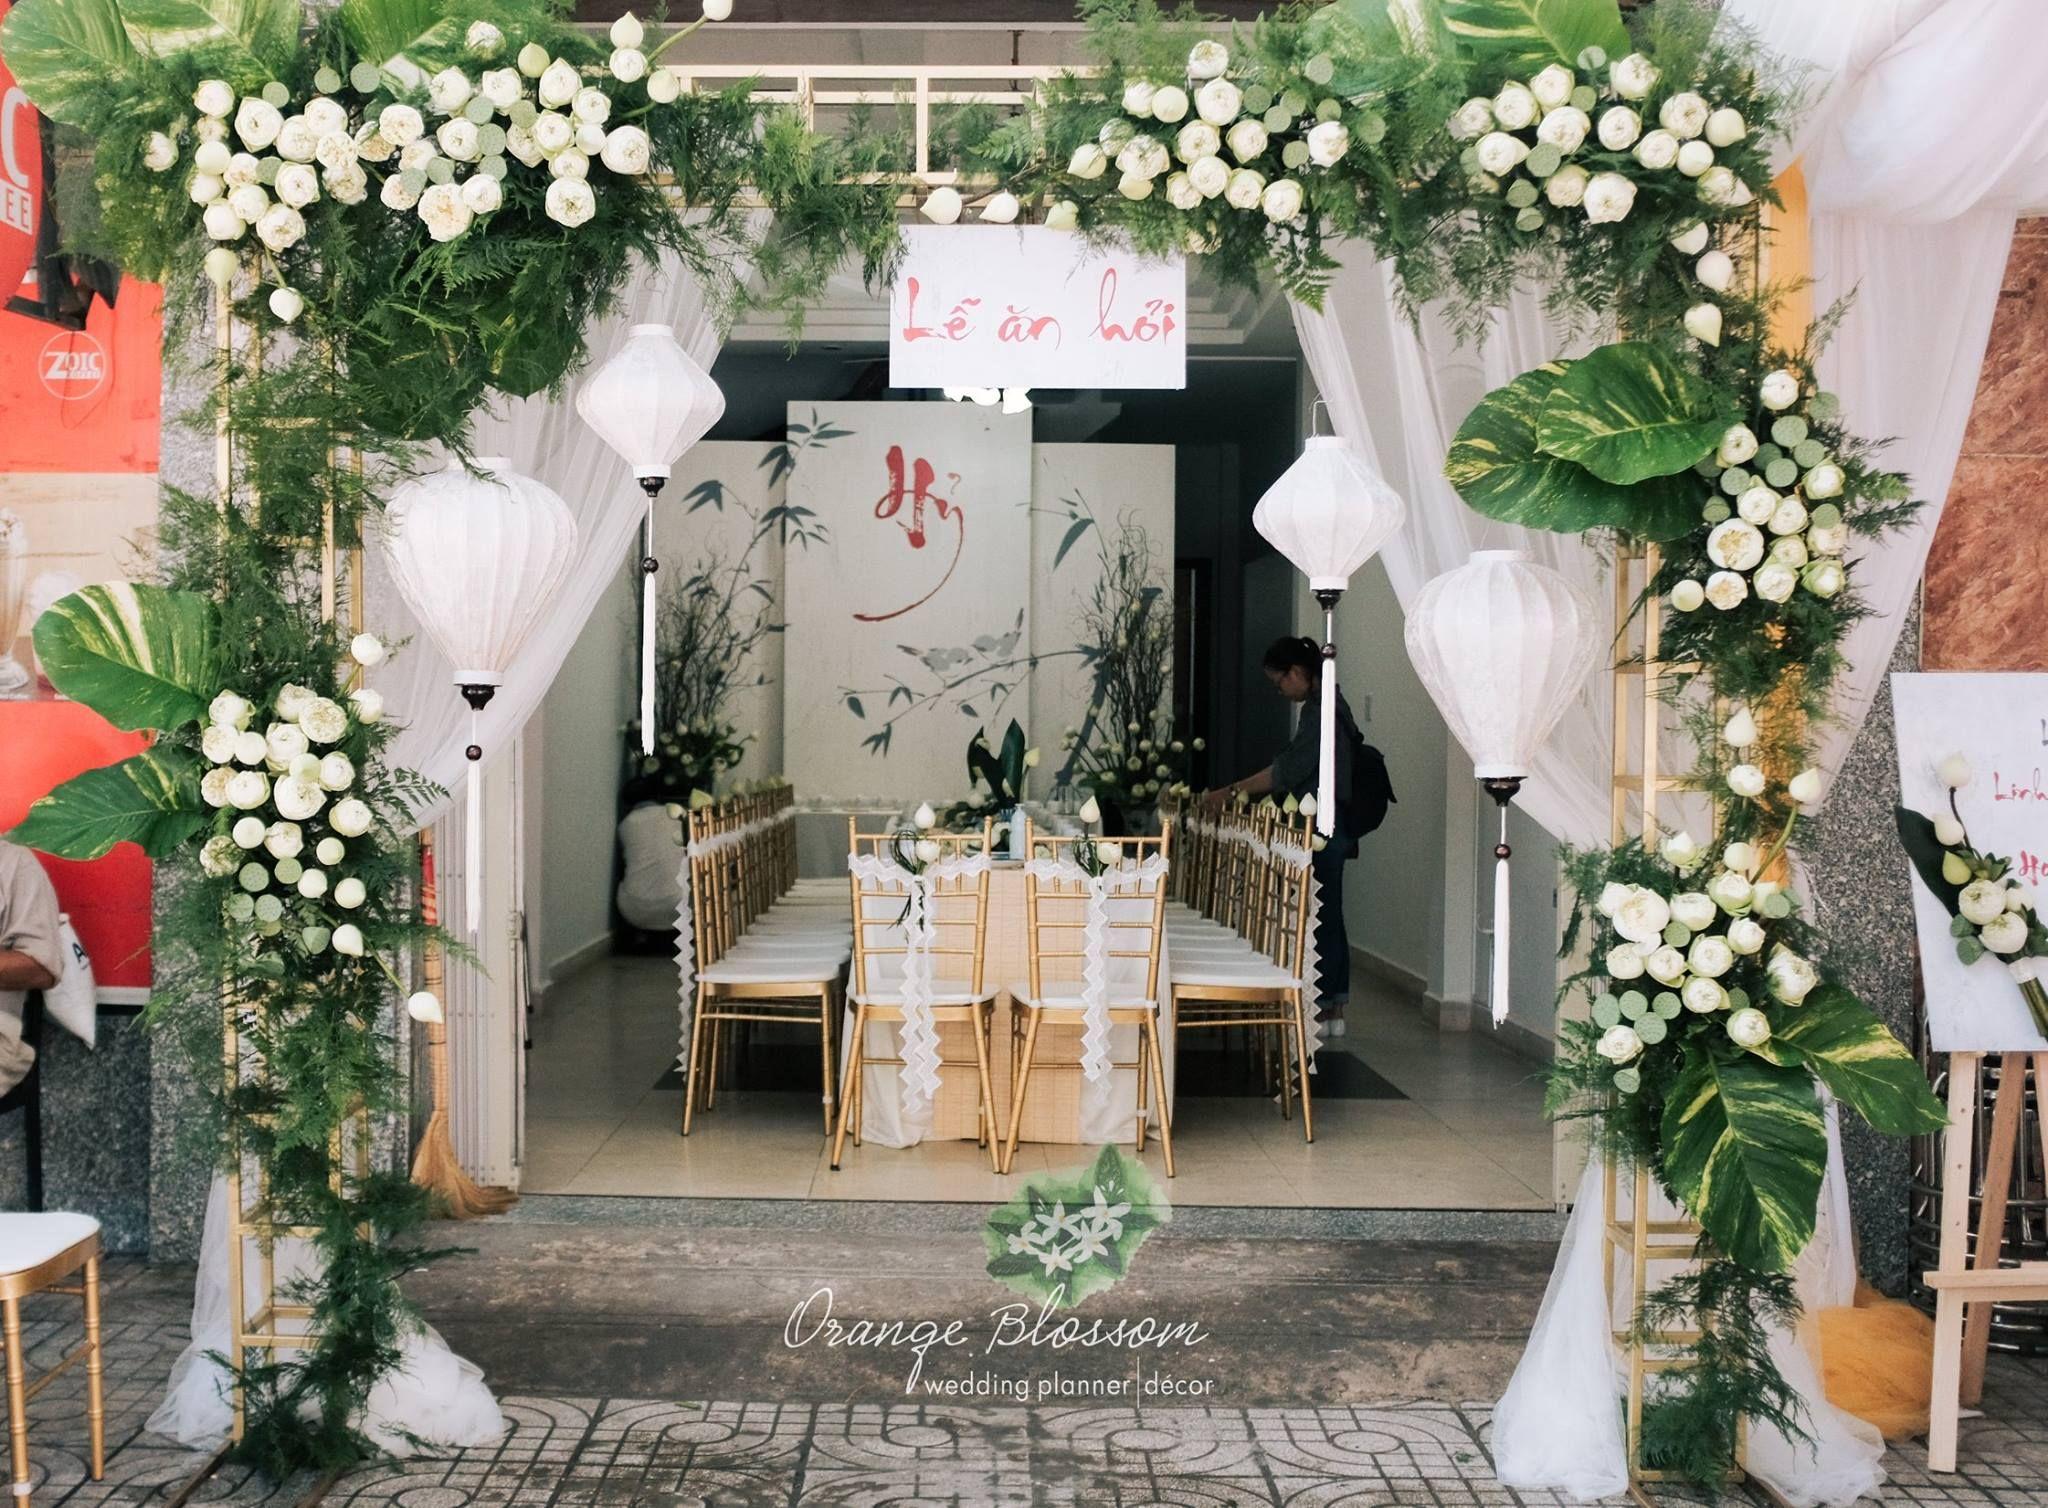 Ideas of wedding decorations  Pin by tt on Vu Quy Decor  Pinterest